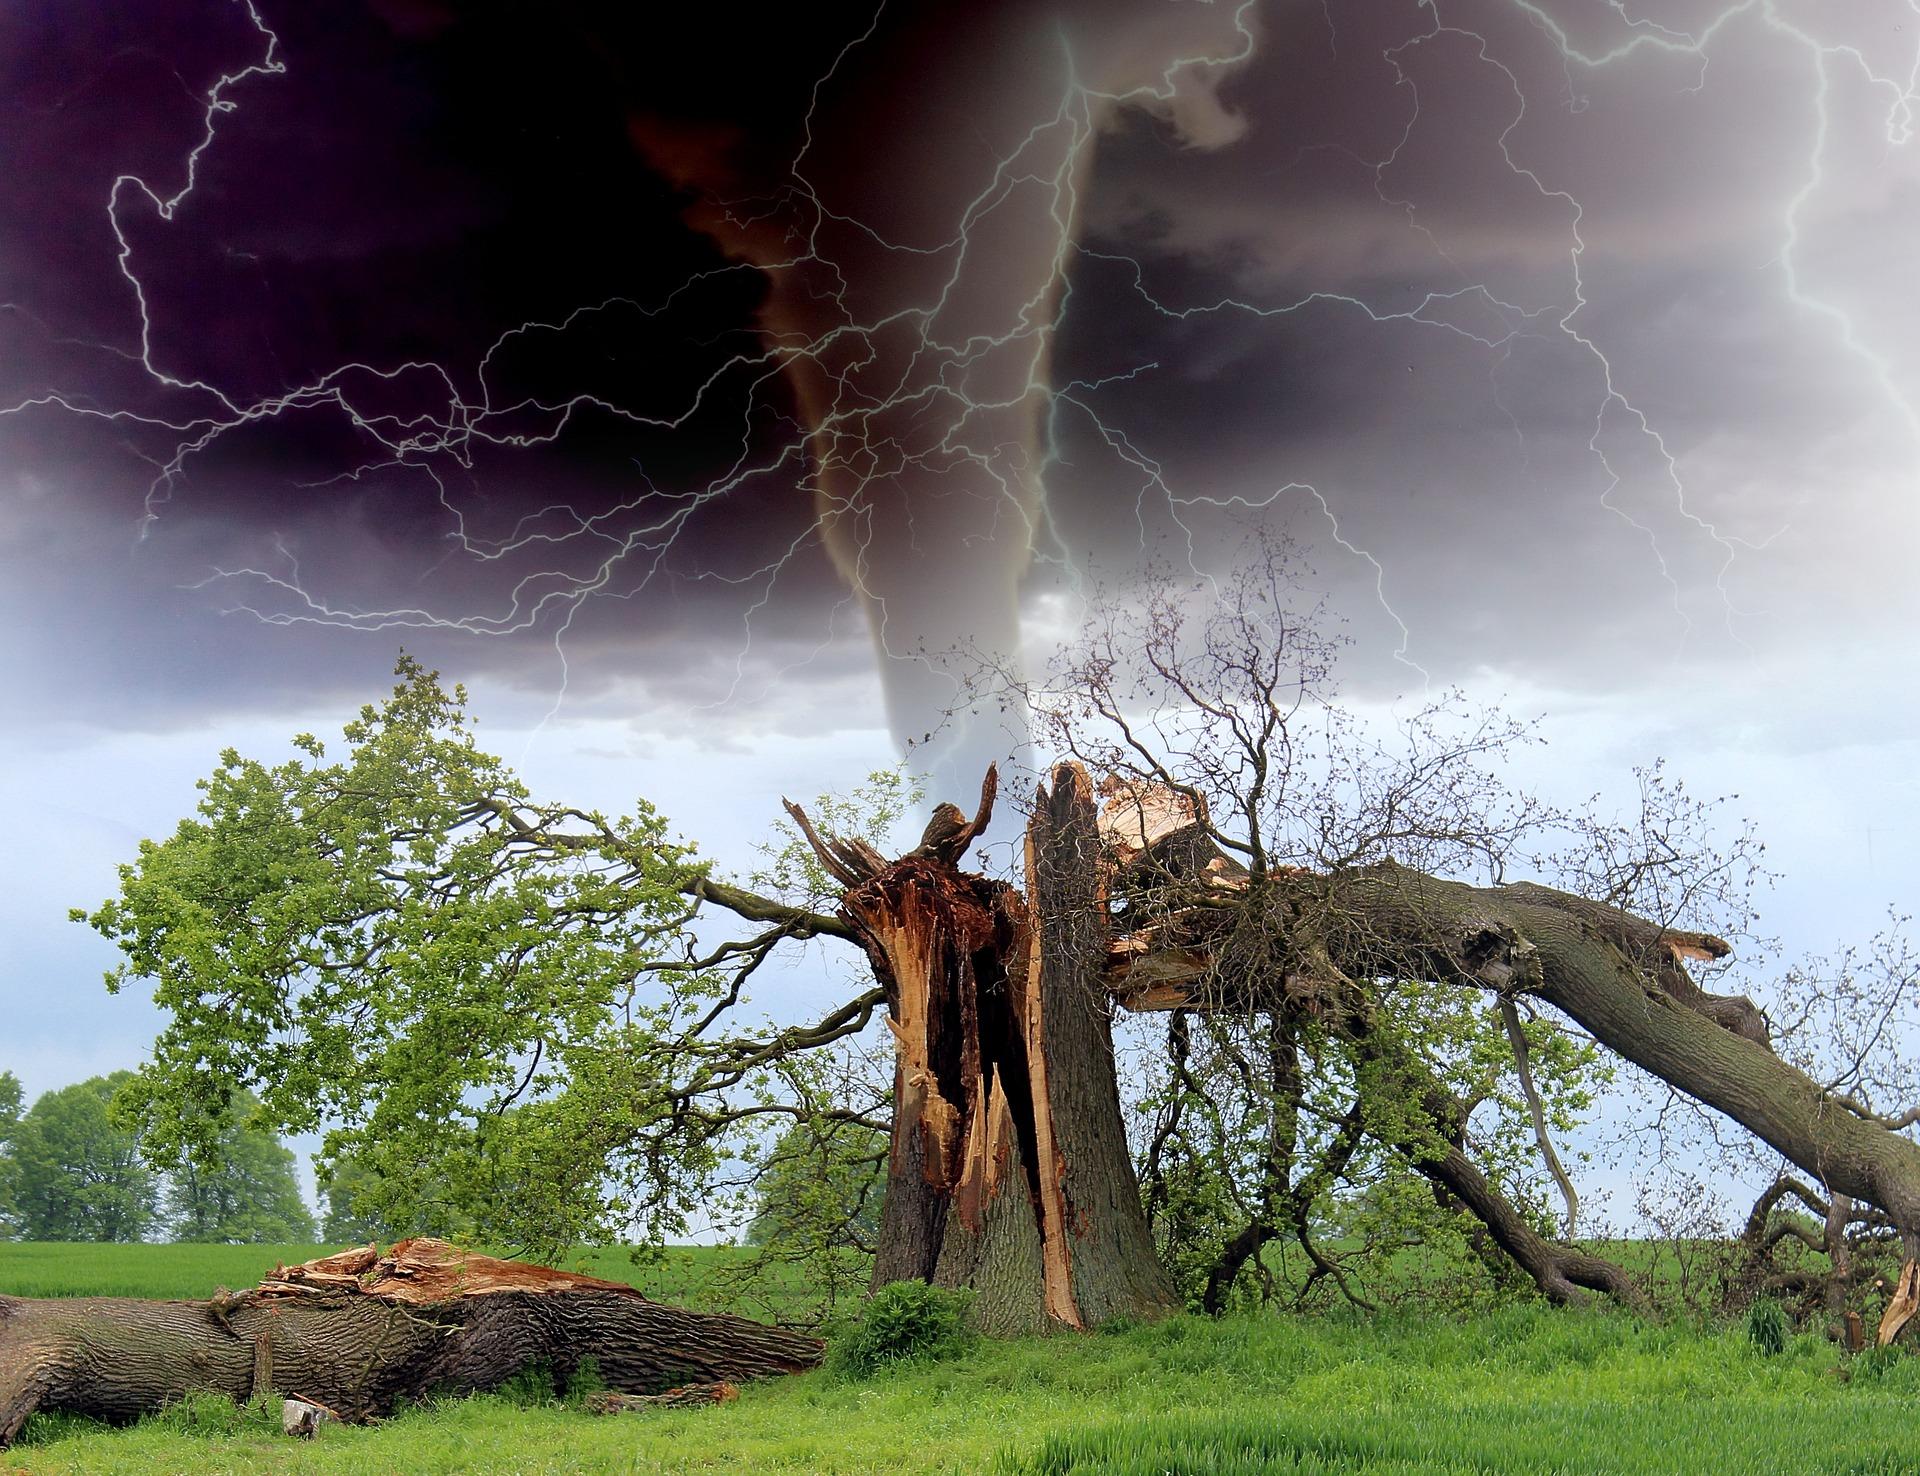 Burza w lesie – i co teraz?